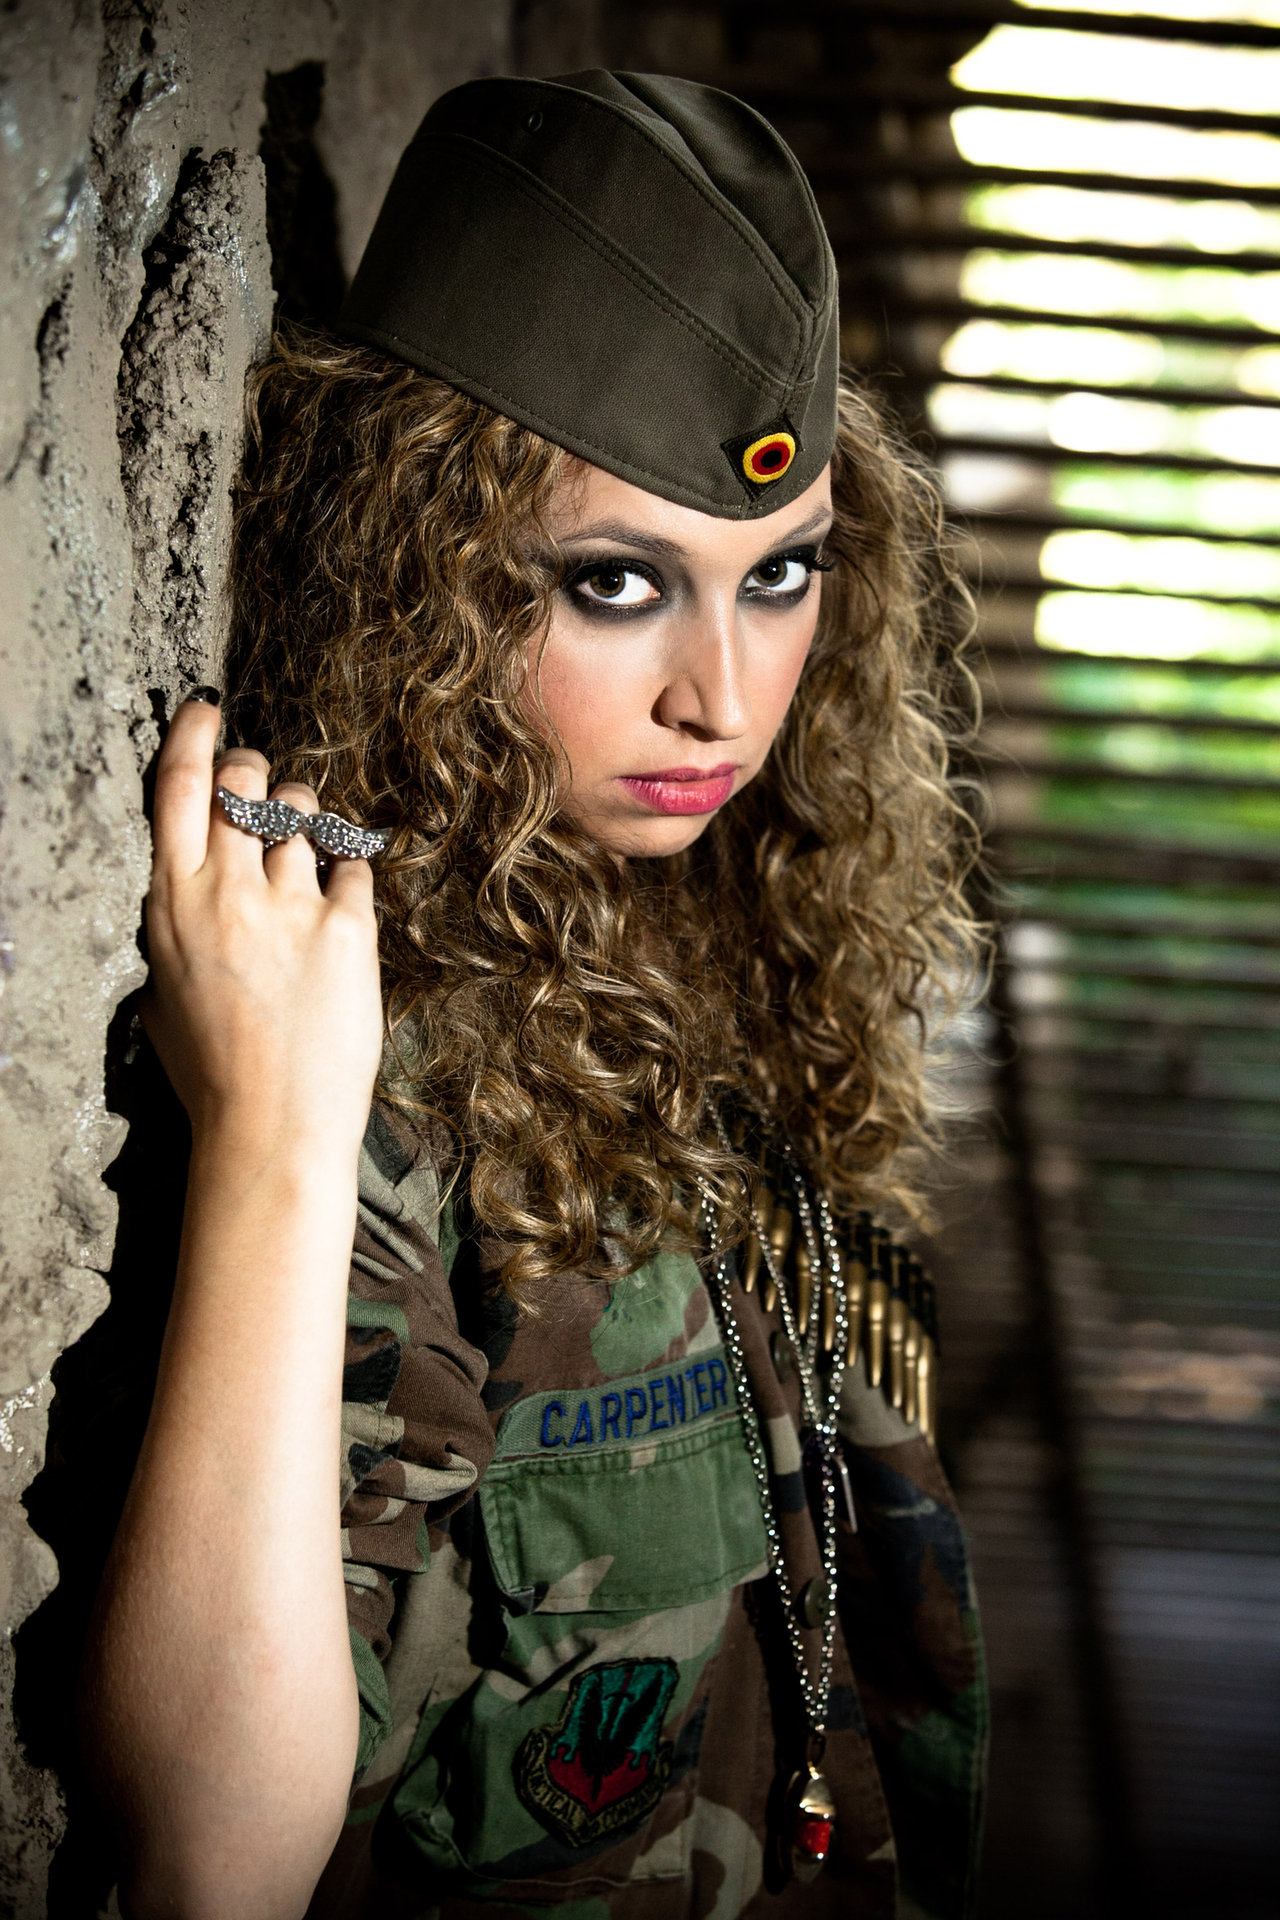 Musician Lissa Lauria